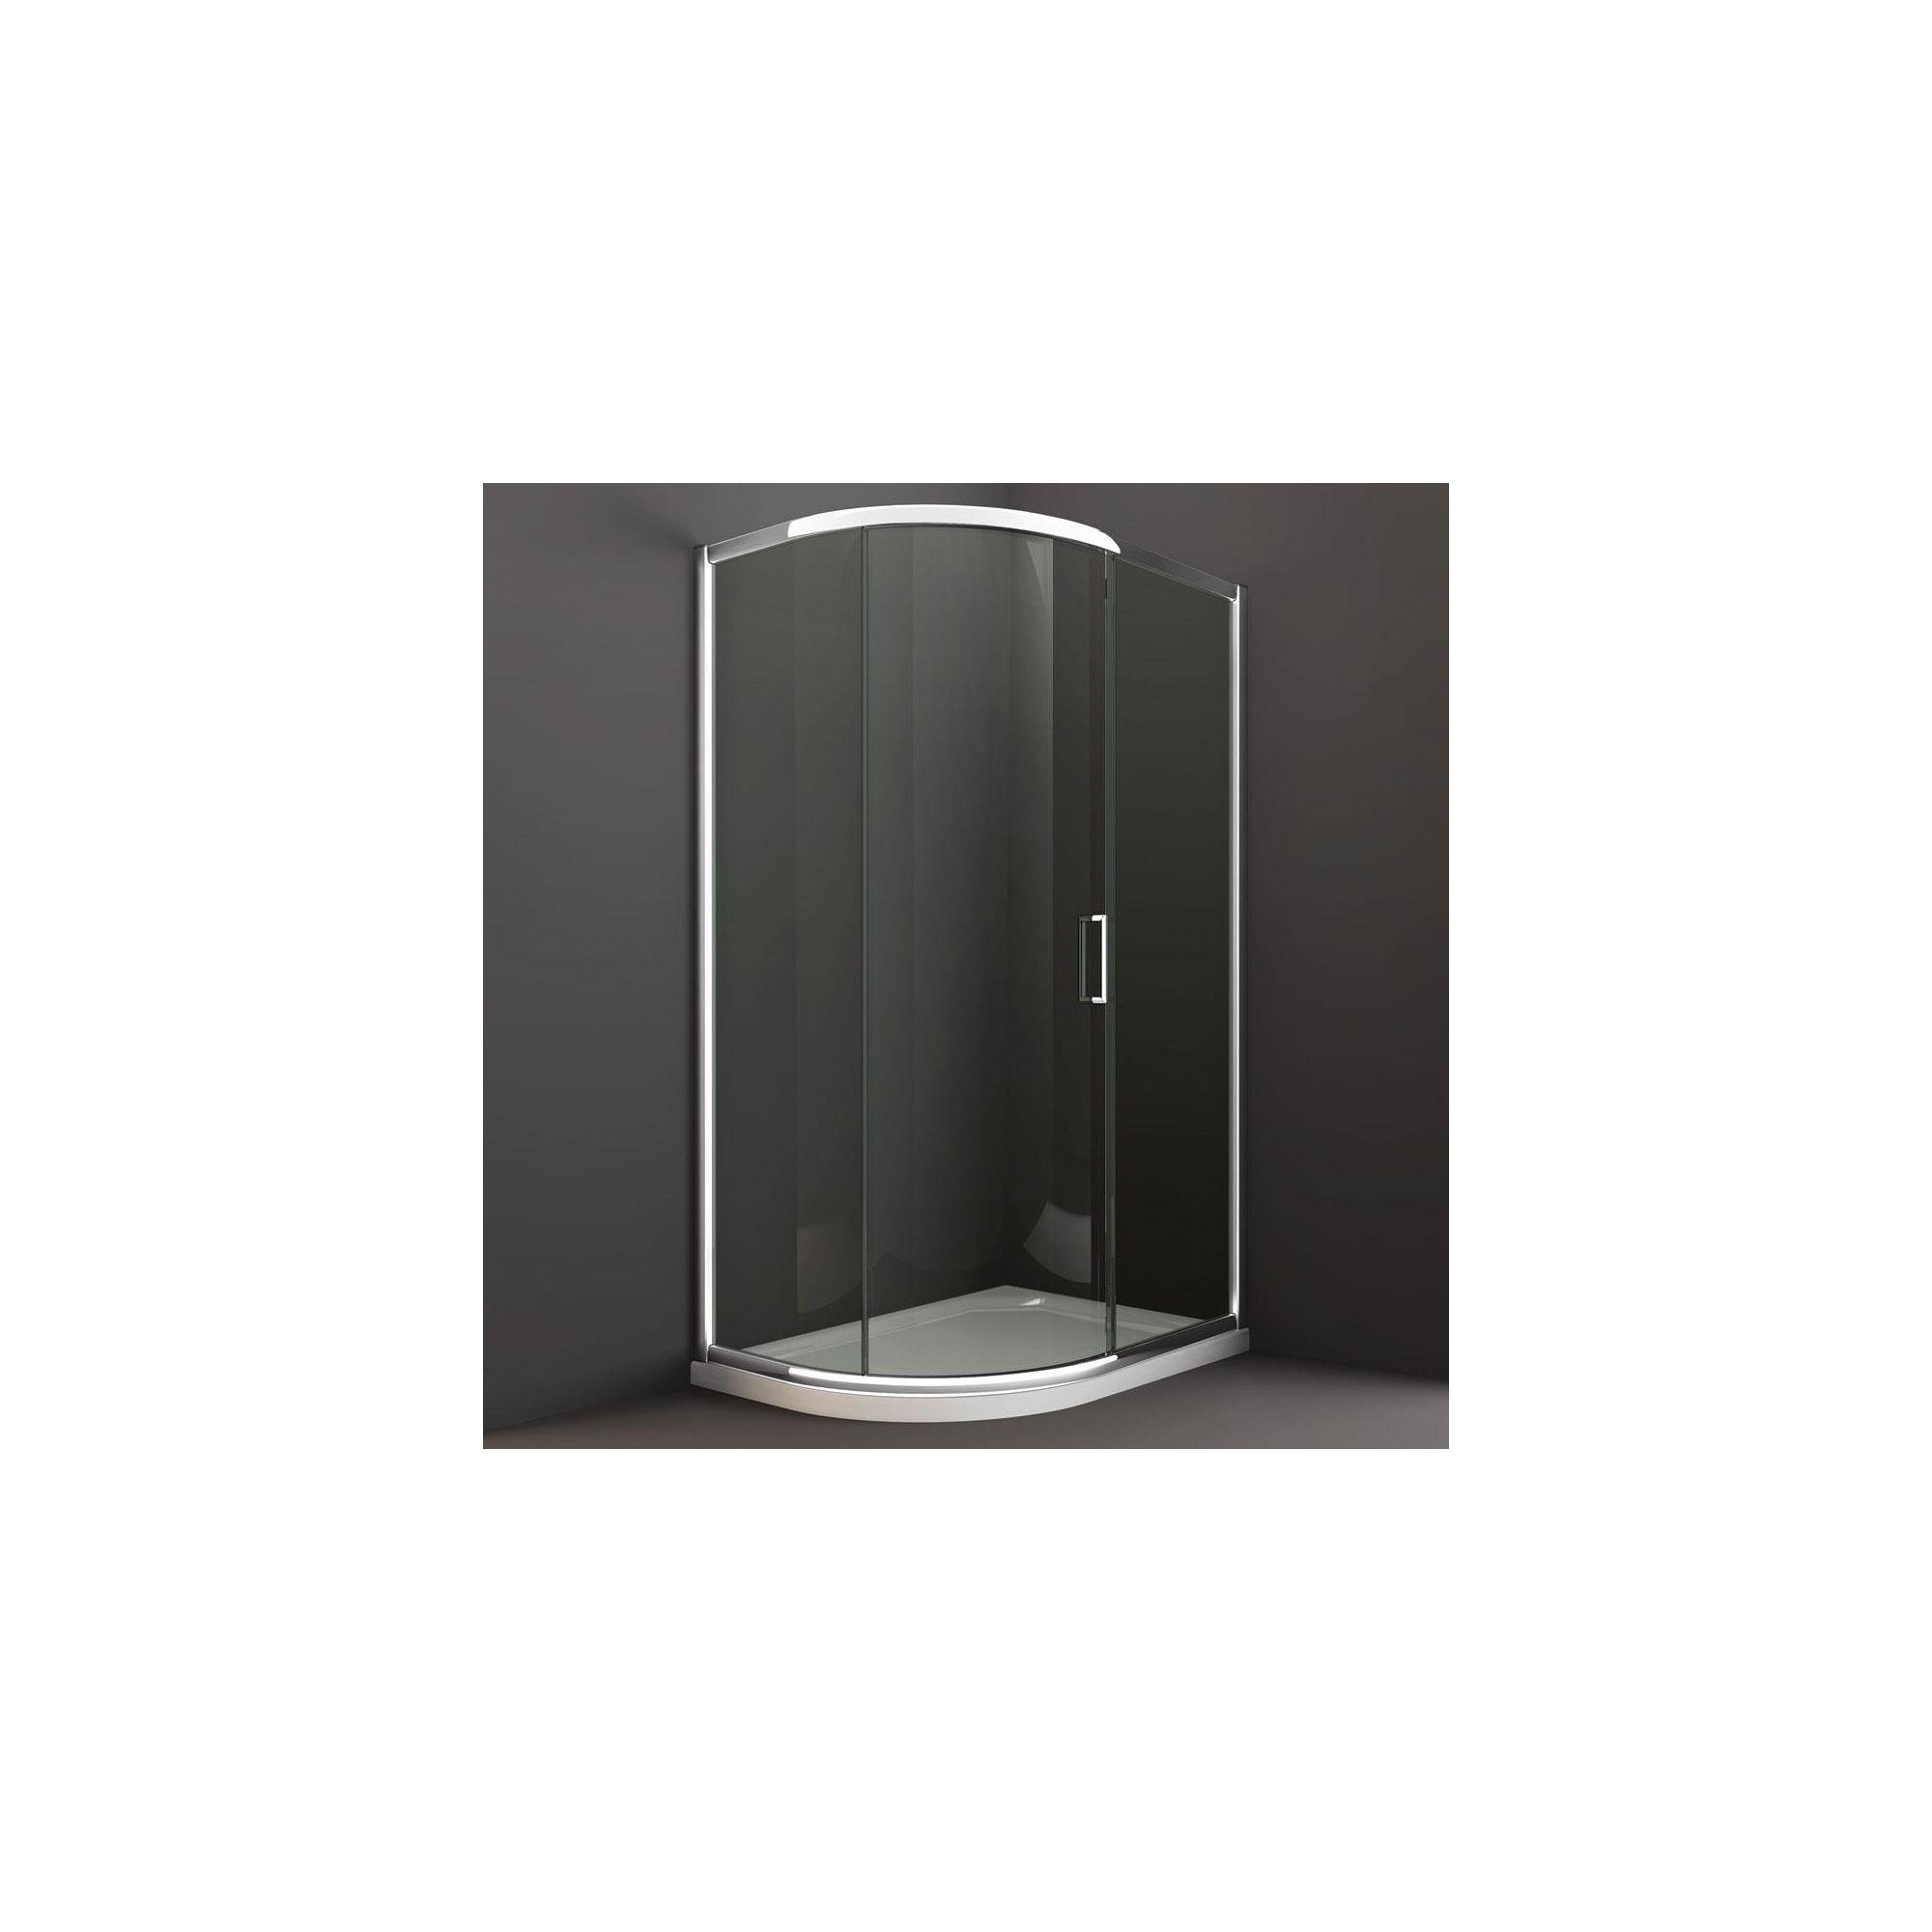 Merlyn Series 8 Offset Quadrant Shower Door, 900mm x 760mm, Chrome Frame, 8mm Glass at Tesco Direct